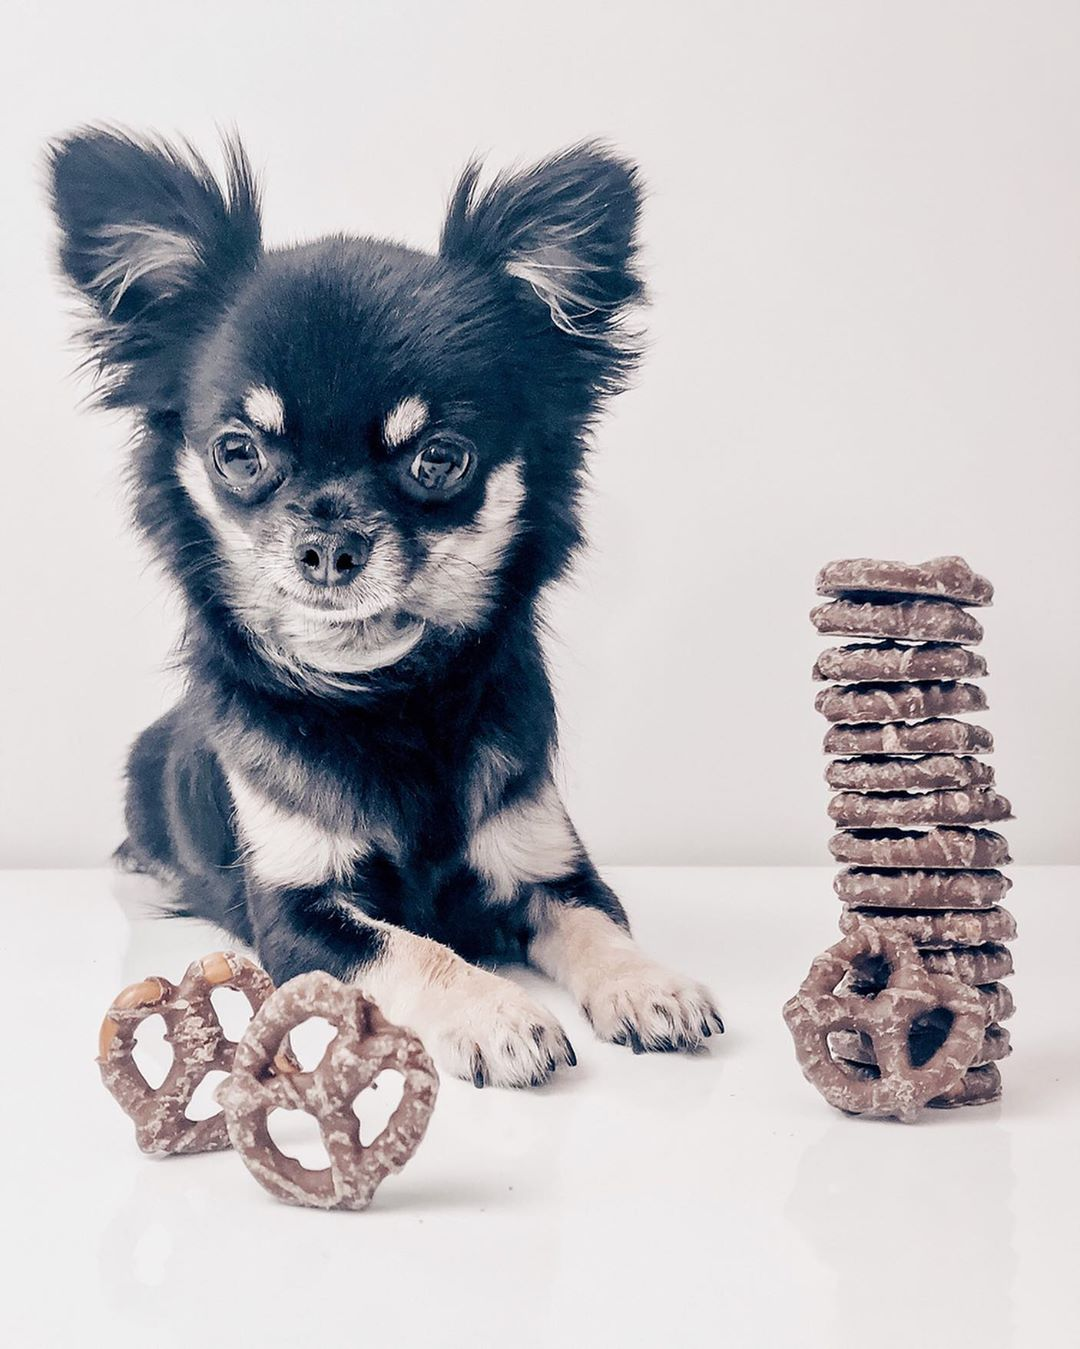 Chihuahua Kai On Instagram I Take It Back Monday S